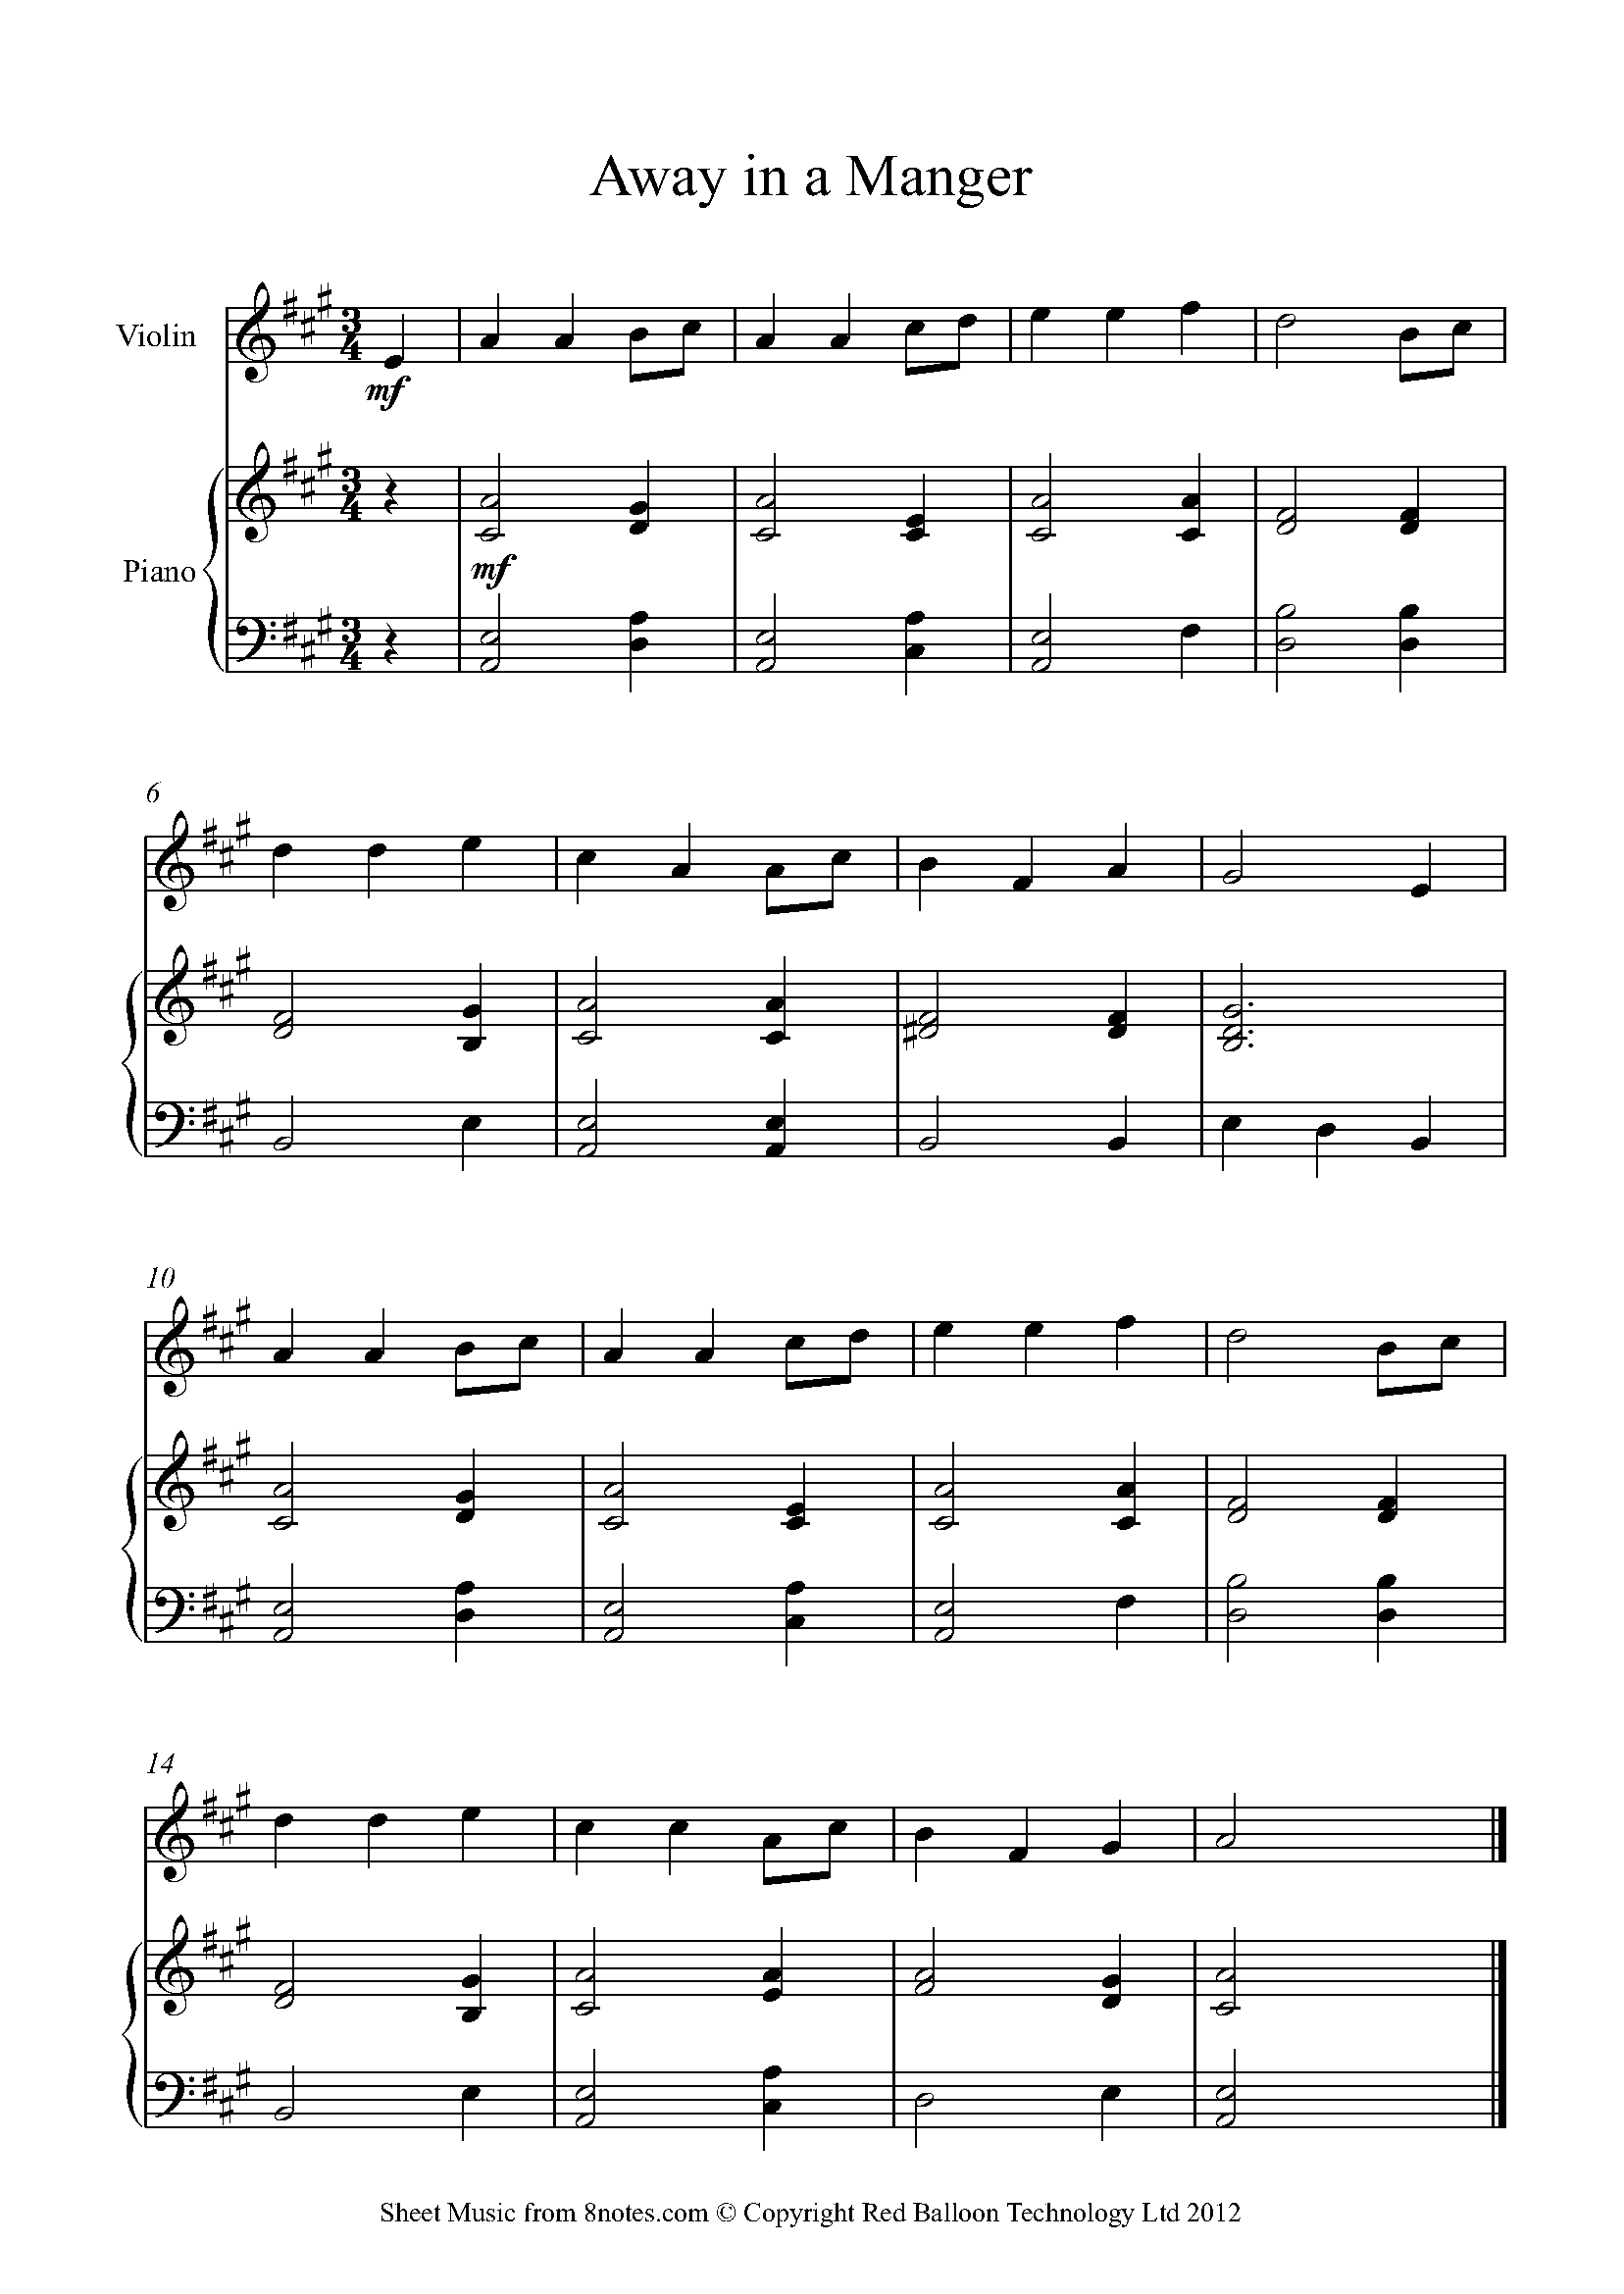 John denver grandma s feather bed sheet music - Away In A Manger Sheet Music For Violin